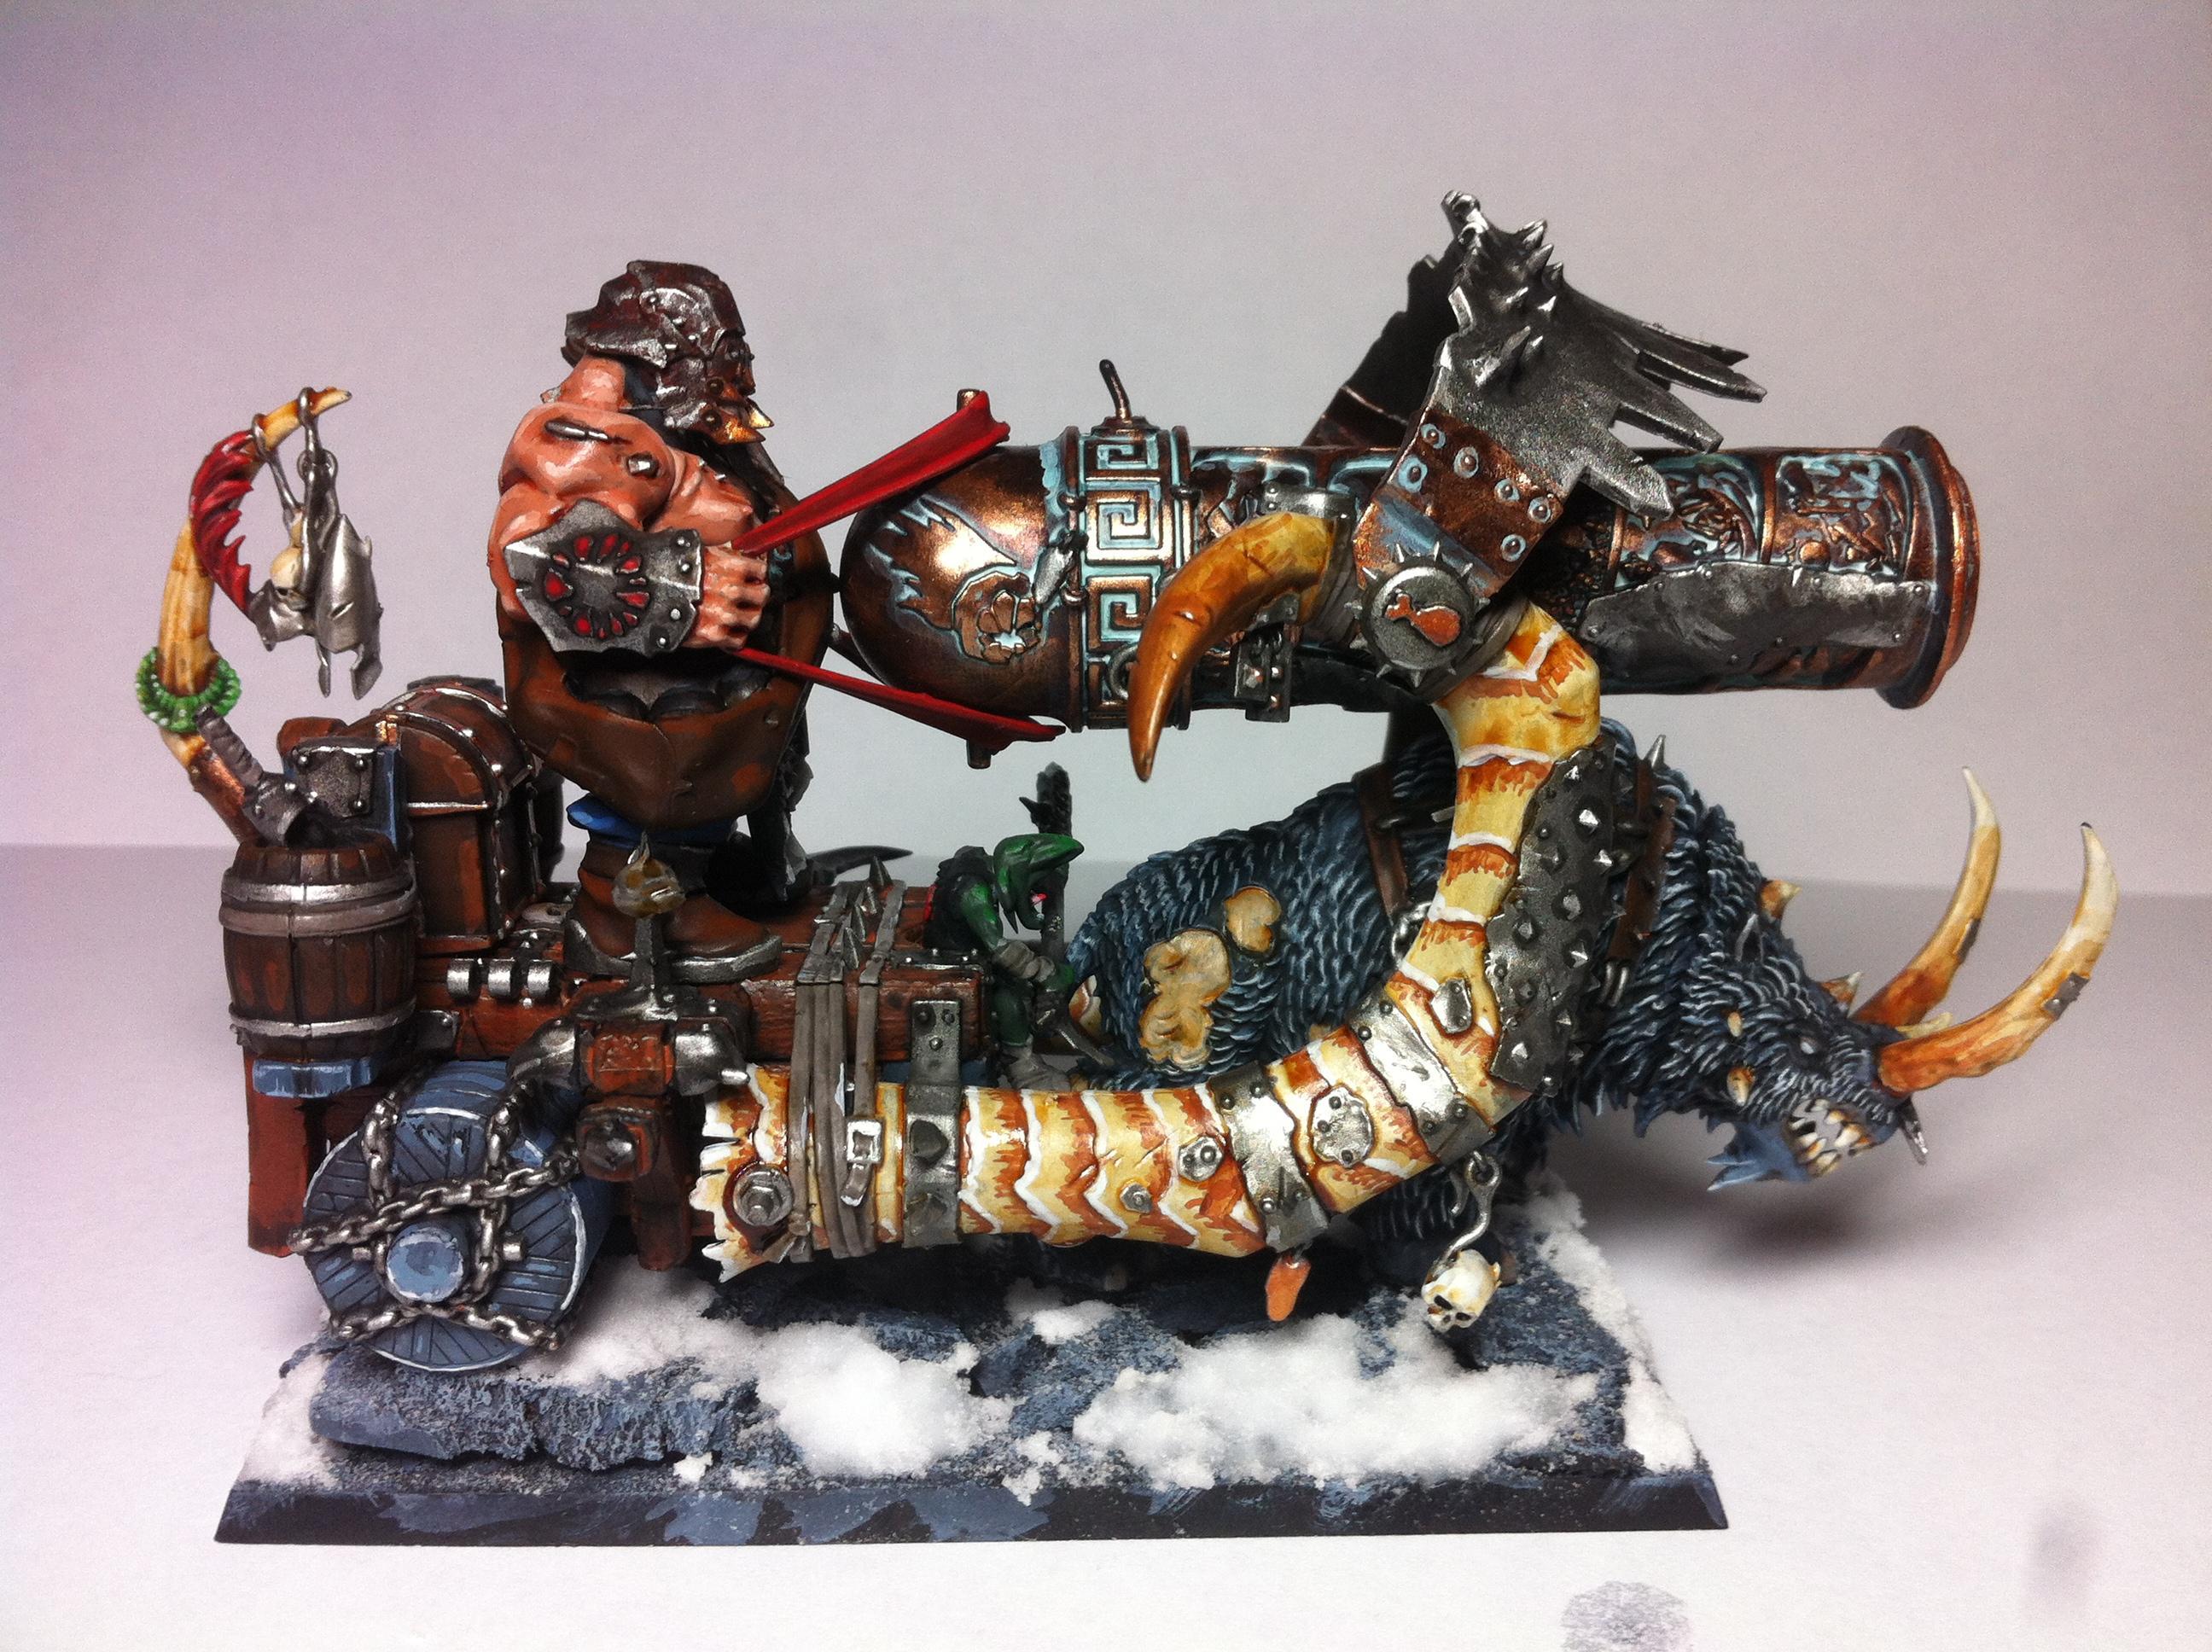 Copper, Ironblaster, Ogre Kingdoms, Ogres, Rusted Effect, Snow